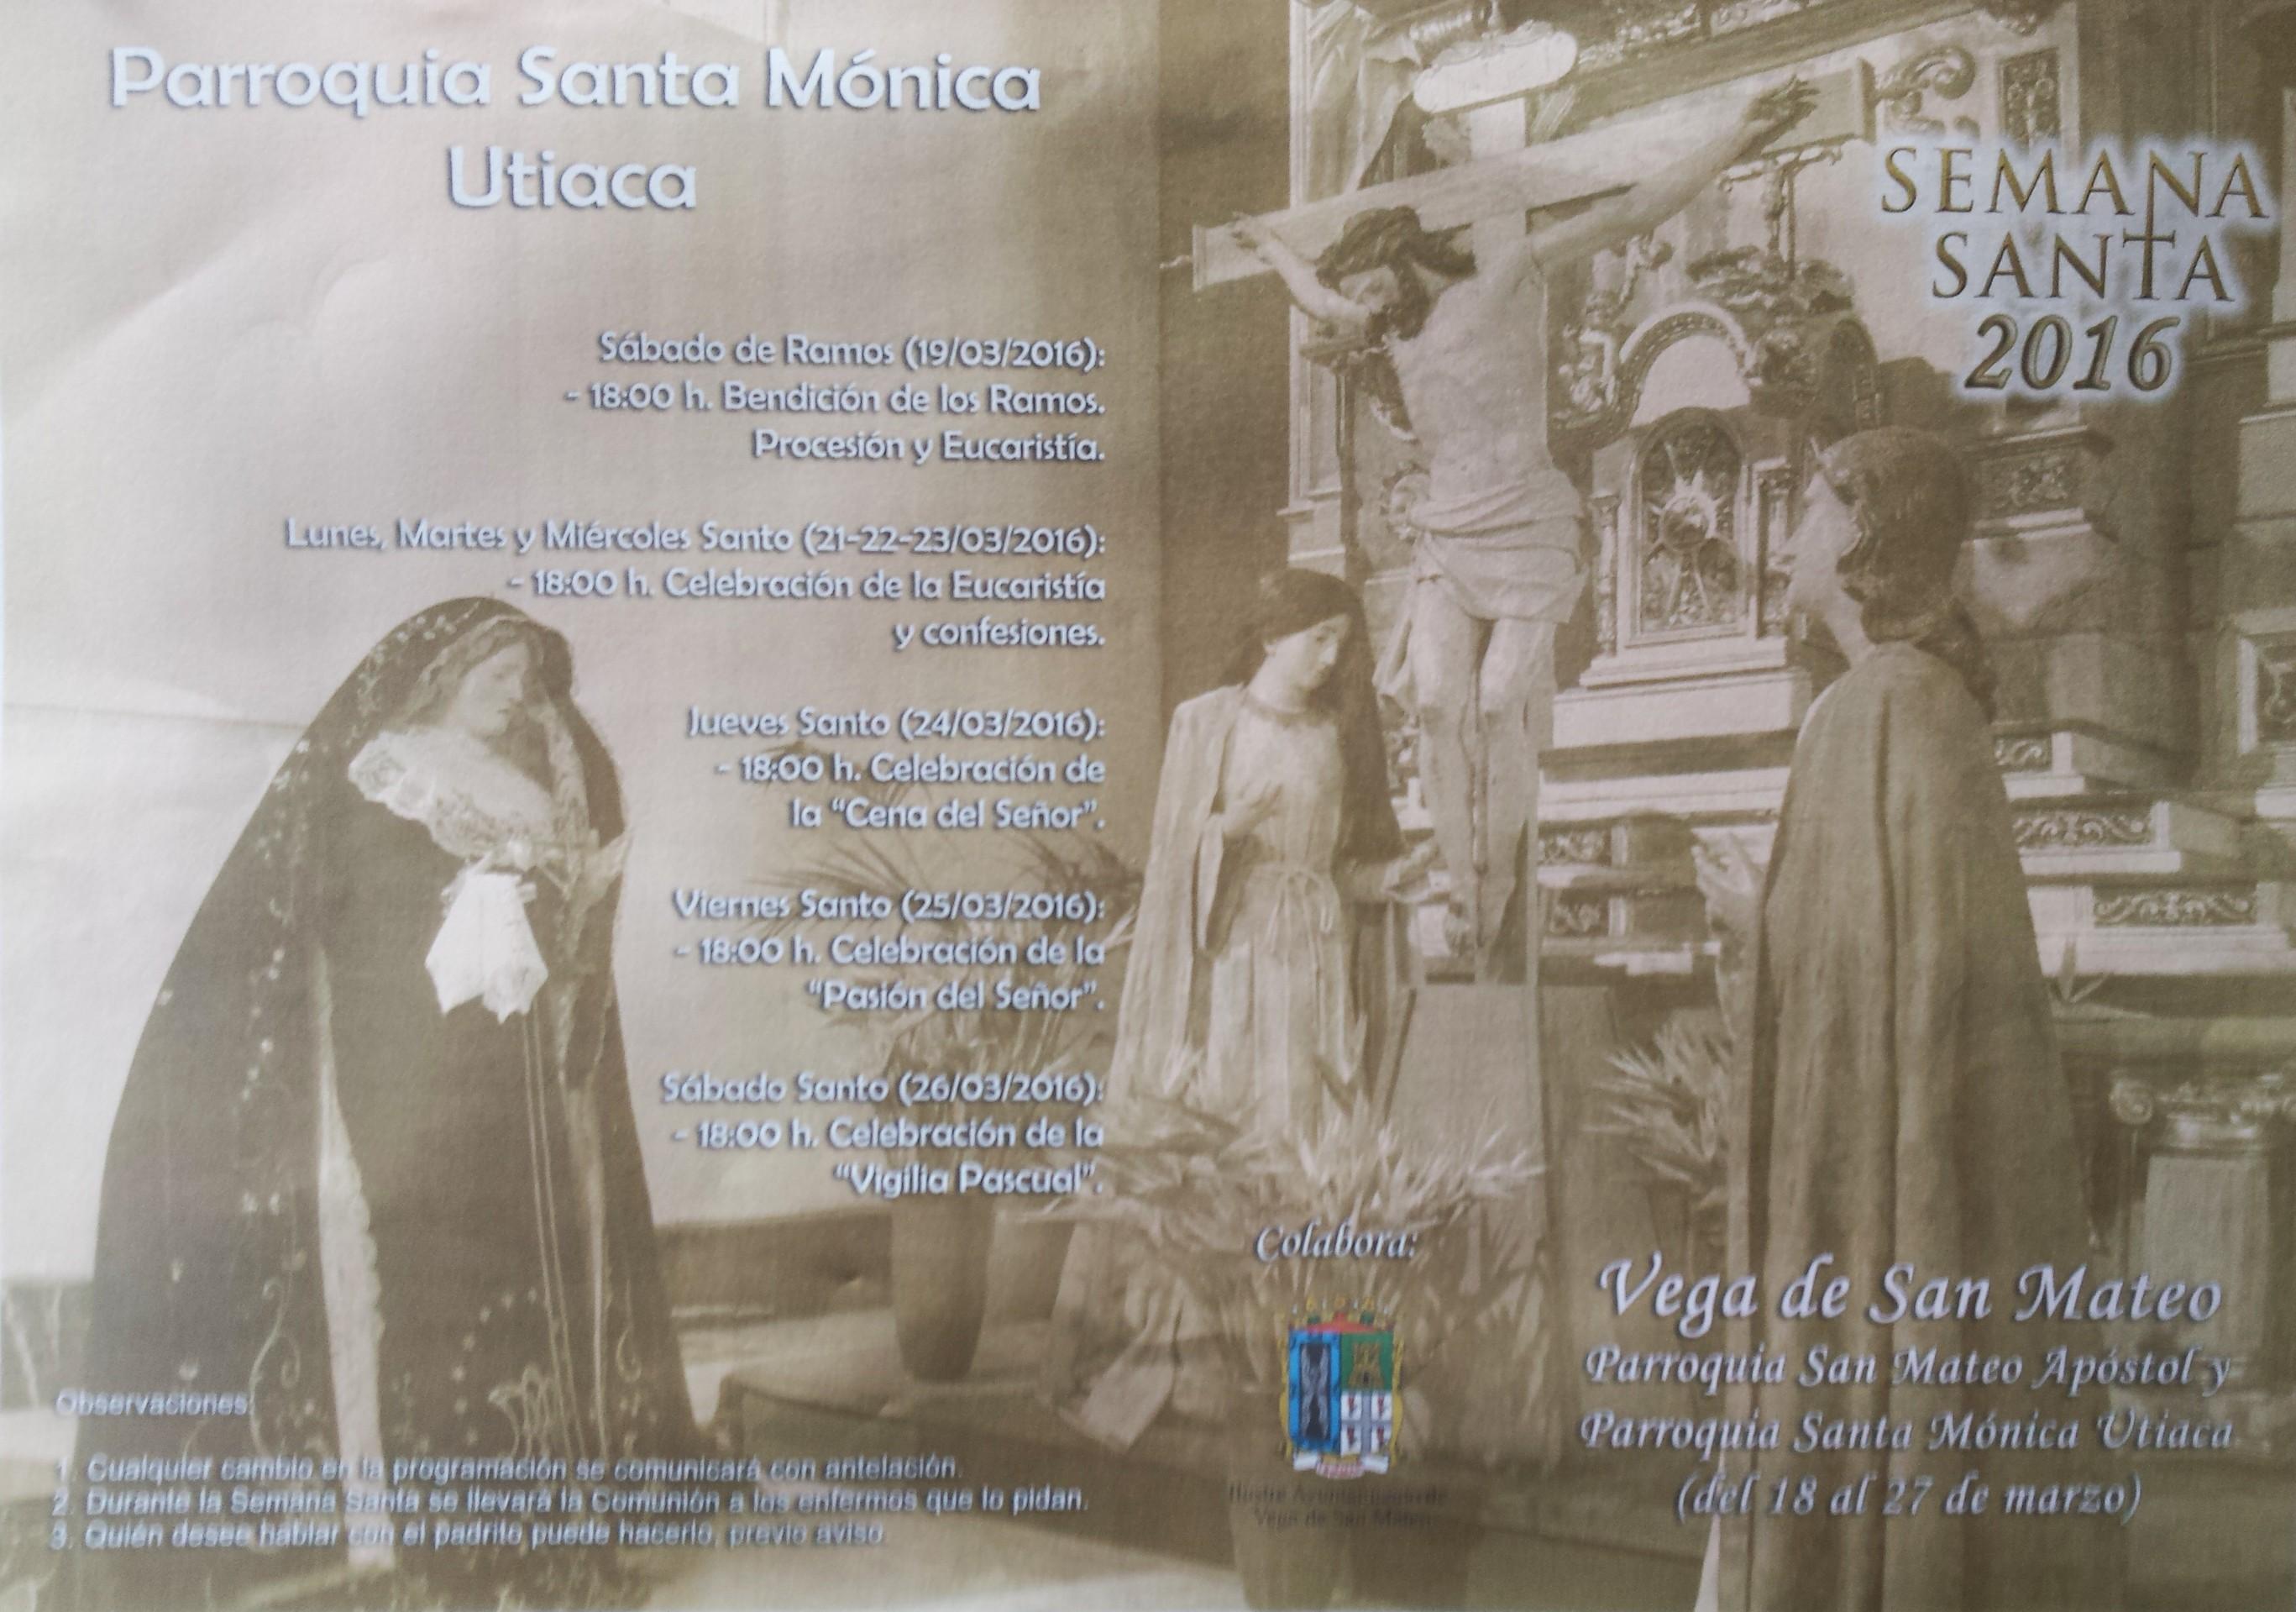 Semana Santa en San Mateo y Utiaca 2016 2